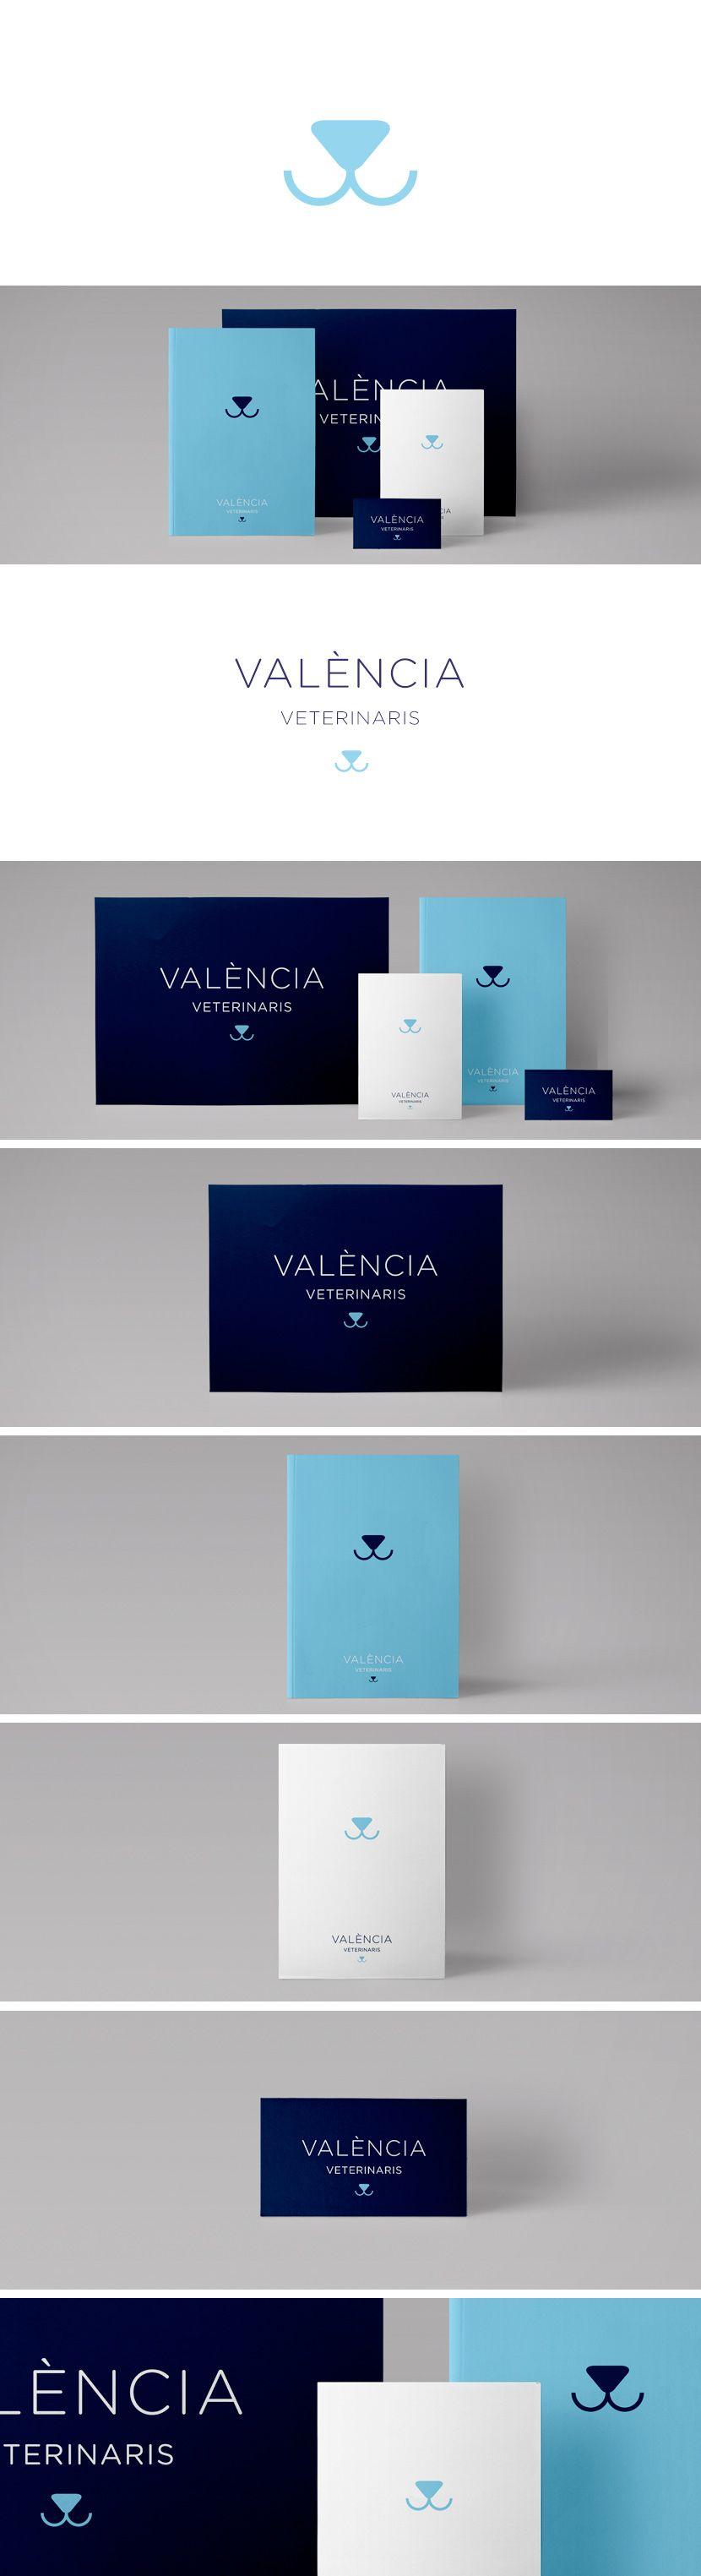 Diseño Logotipo VV - Ariadna Rivera (vestidadeflores.com)